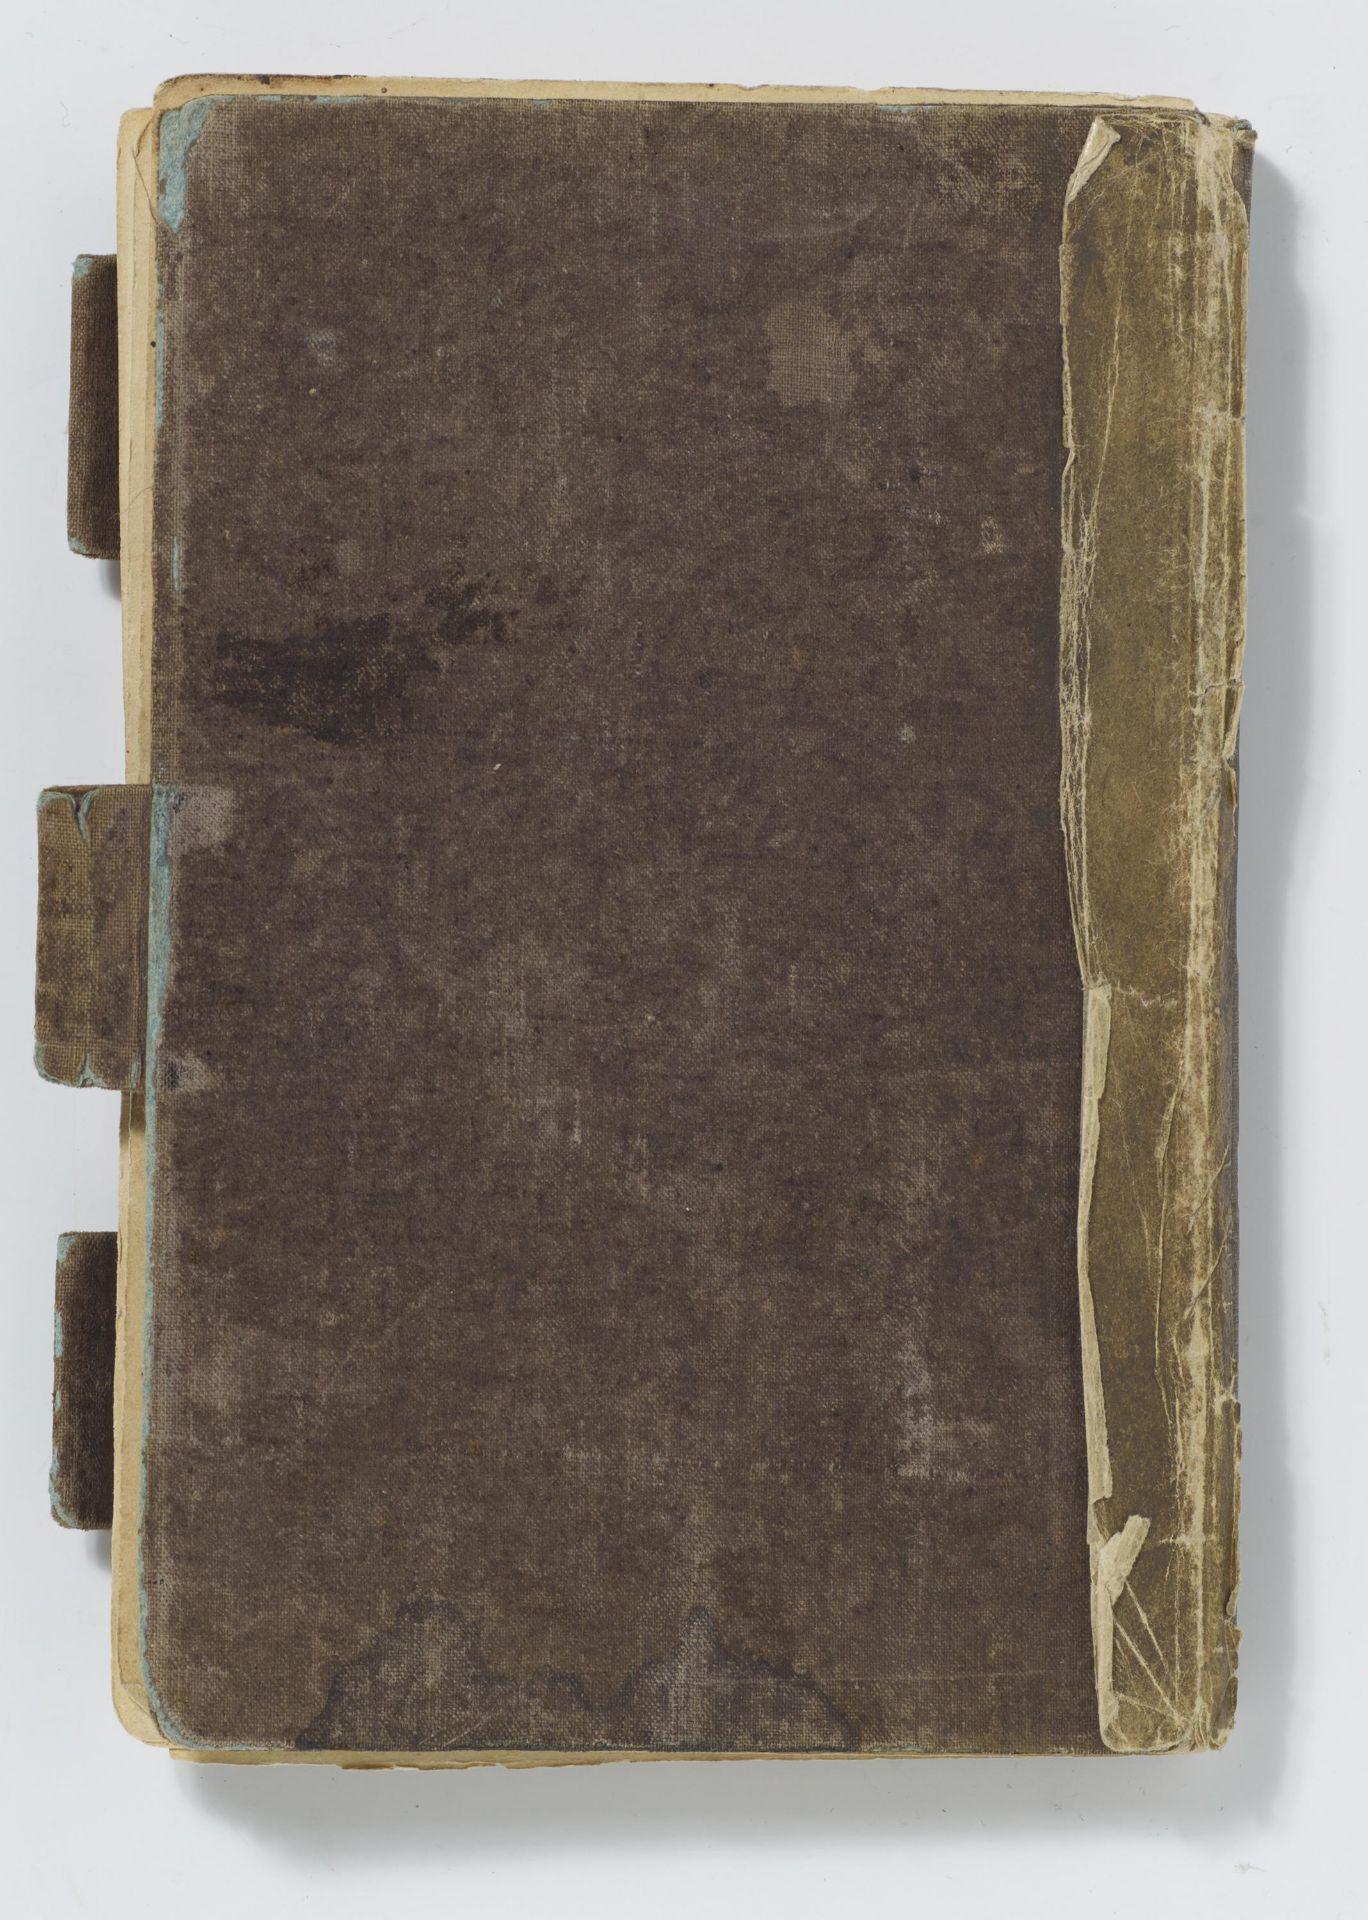 Kaupert, Gustav Kassel 1819 - 1897  Sketchbook, ca. 50 pages. Architecture, Italian landscapes - Bild 3 aus 6